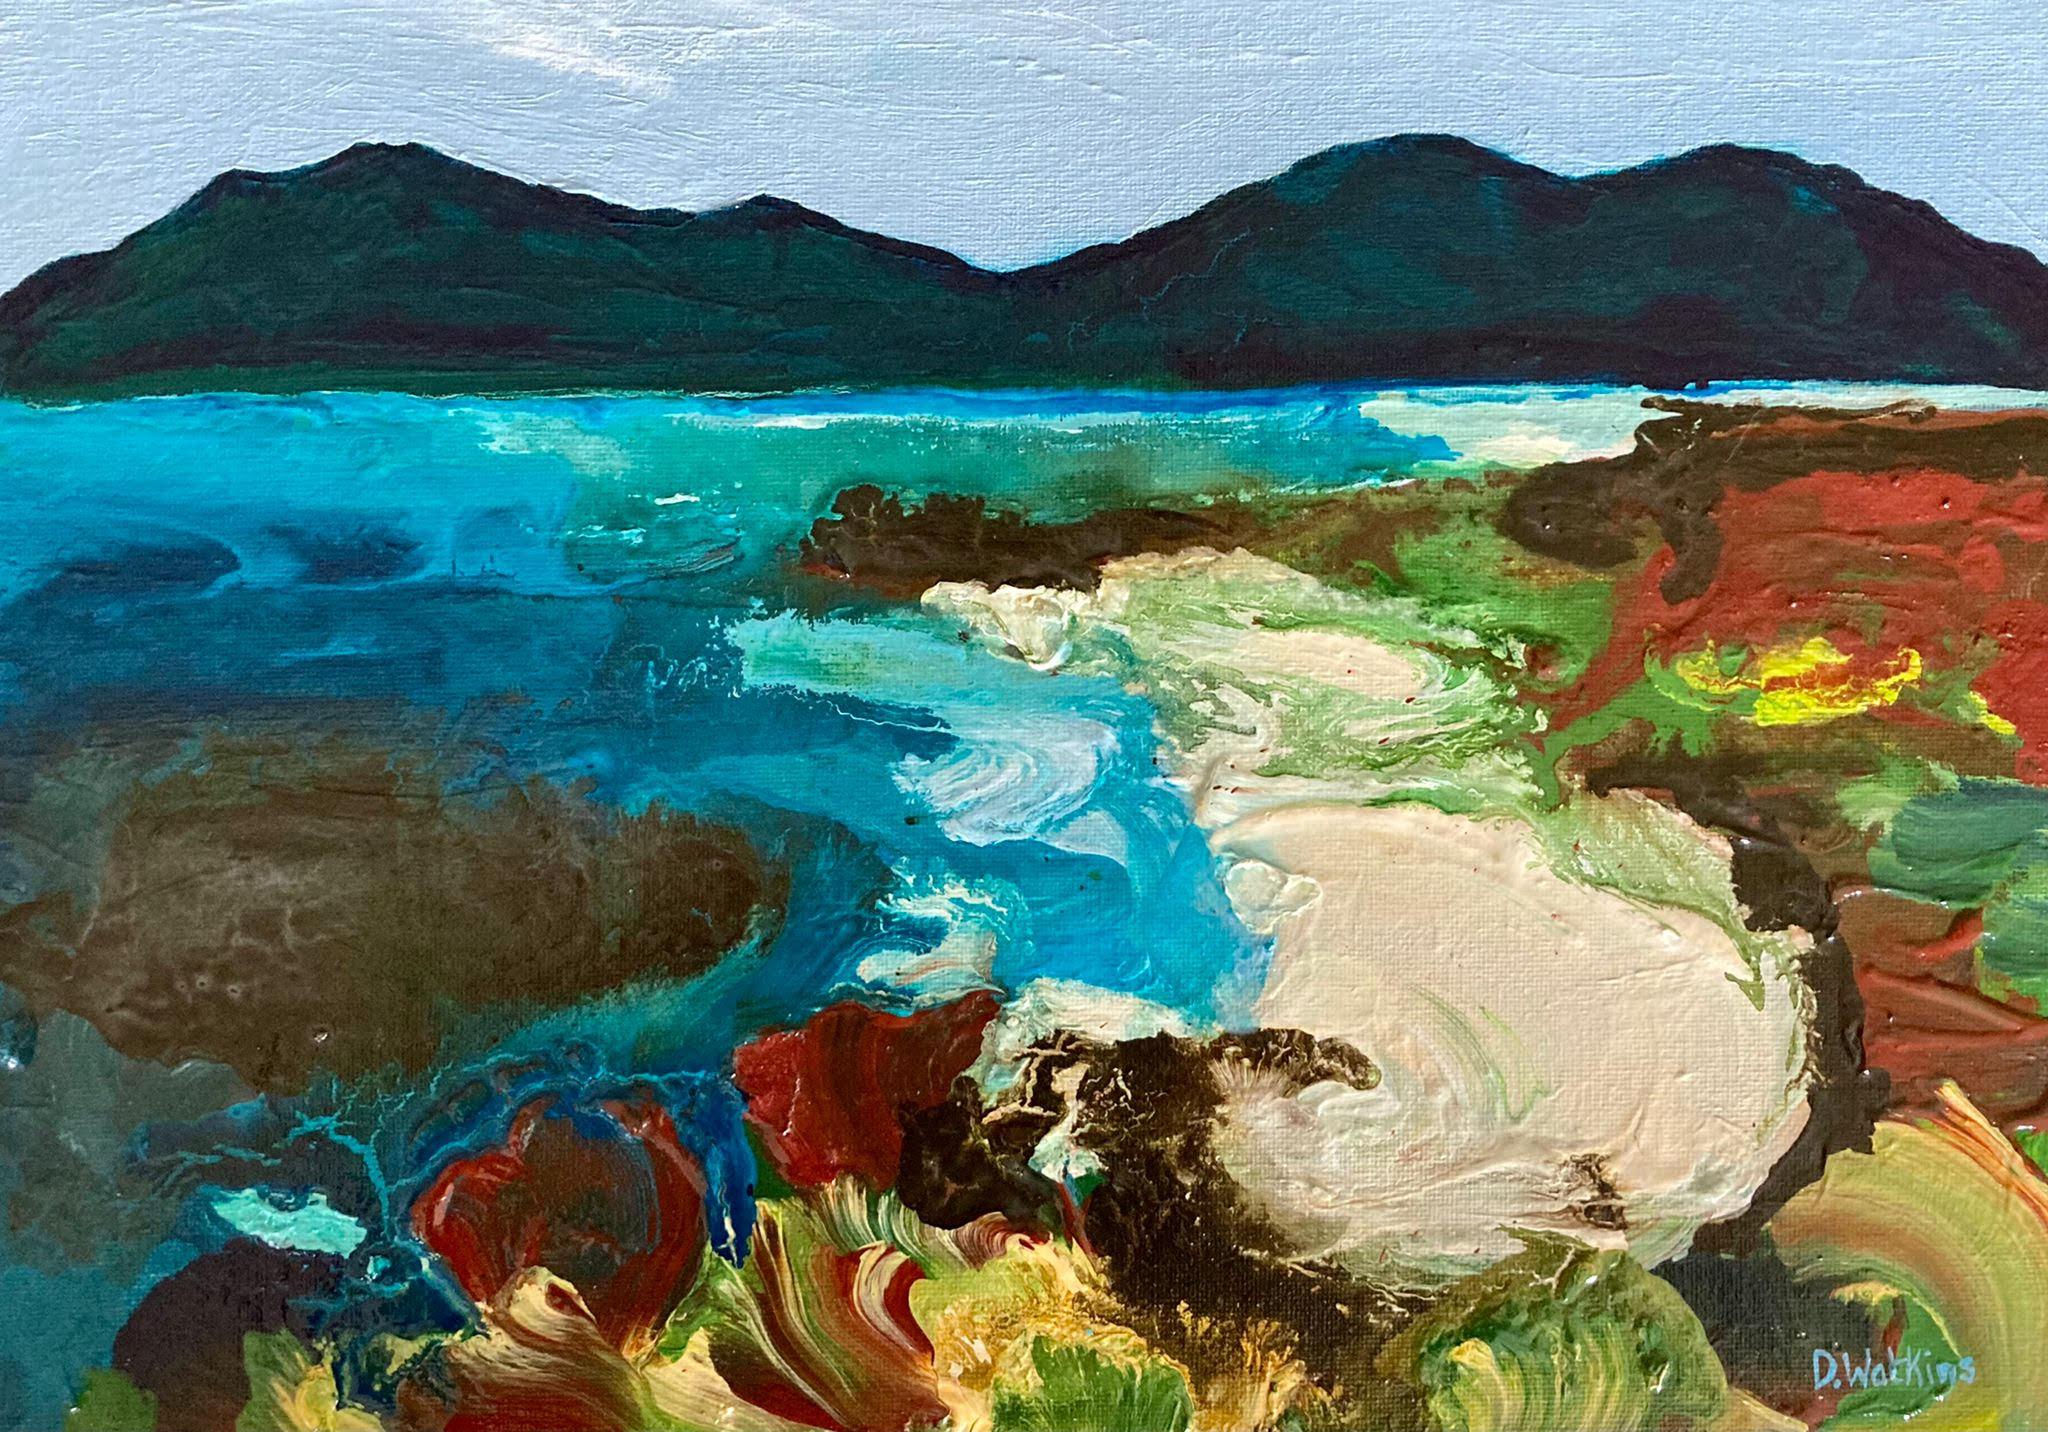 The Edge of the Coast by Debbie Watkins